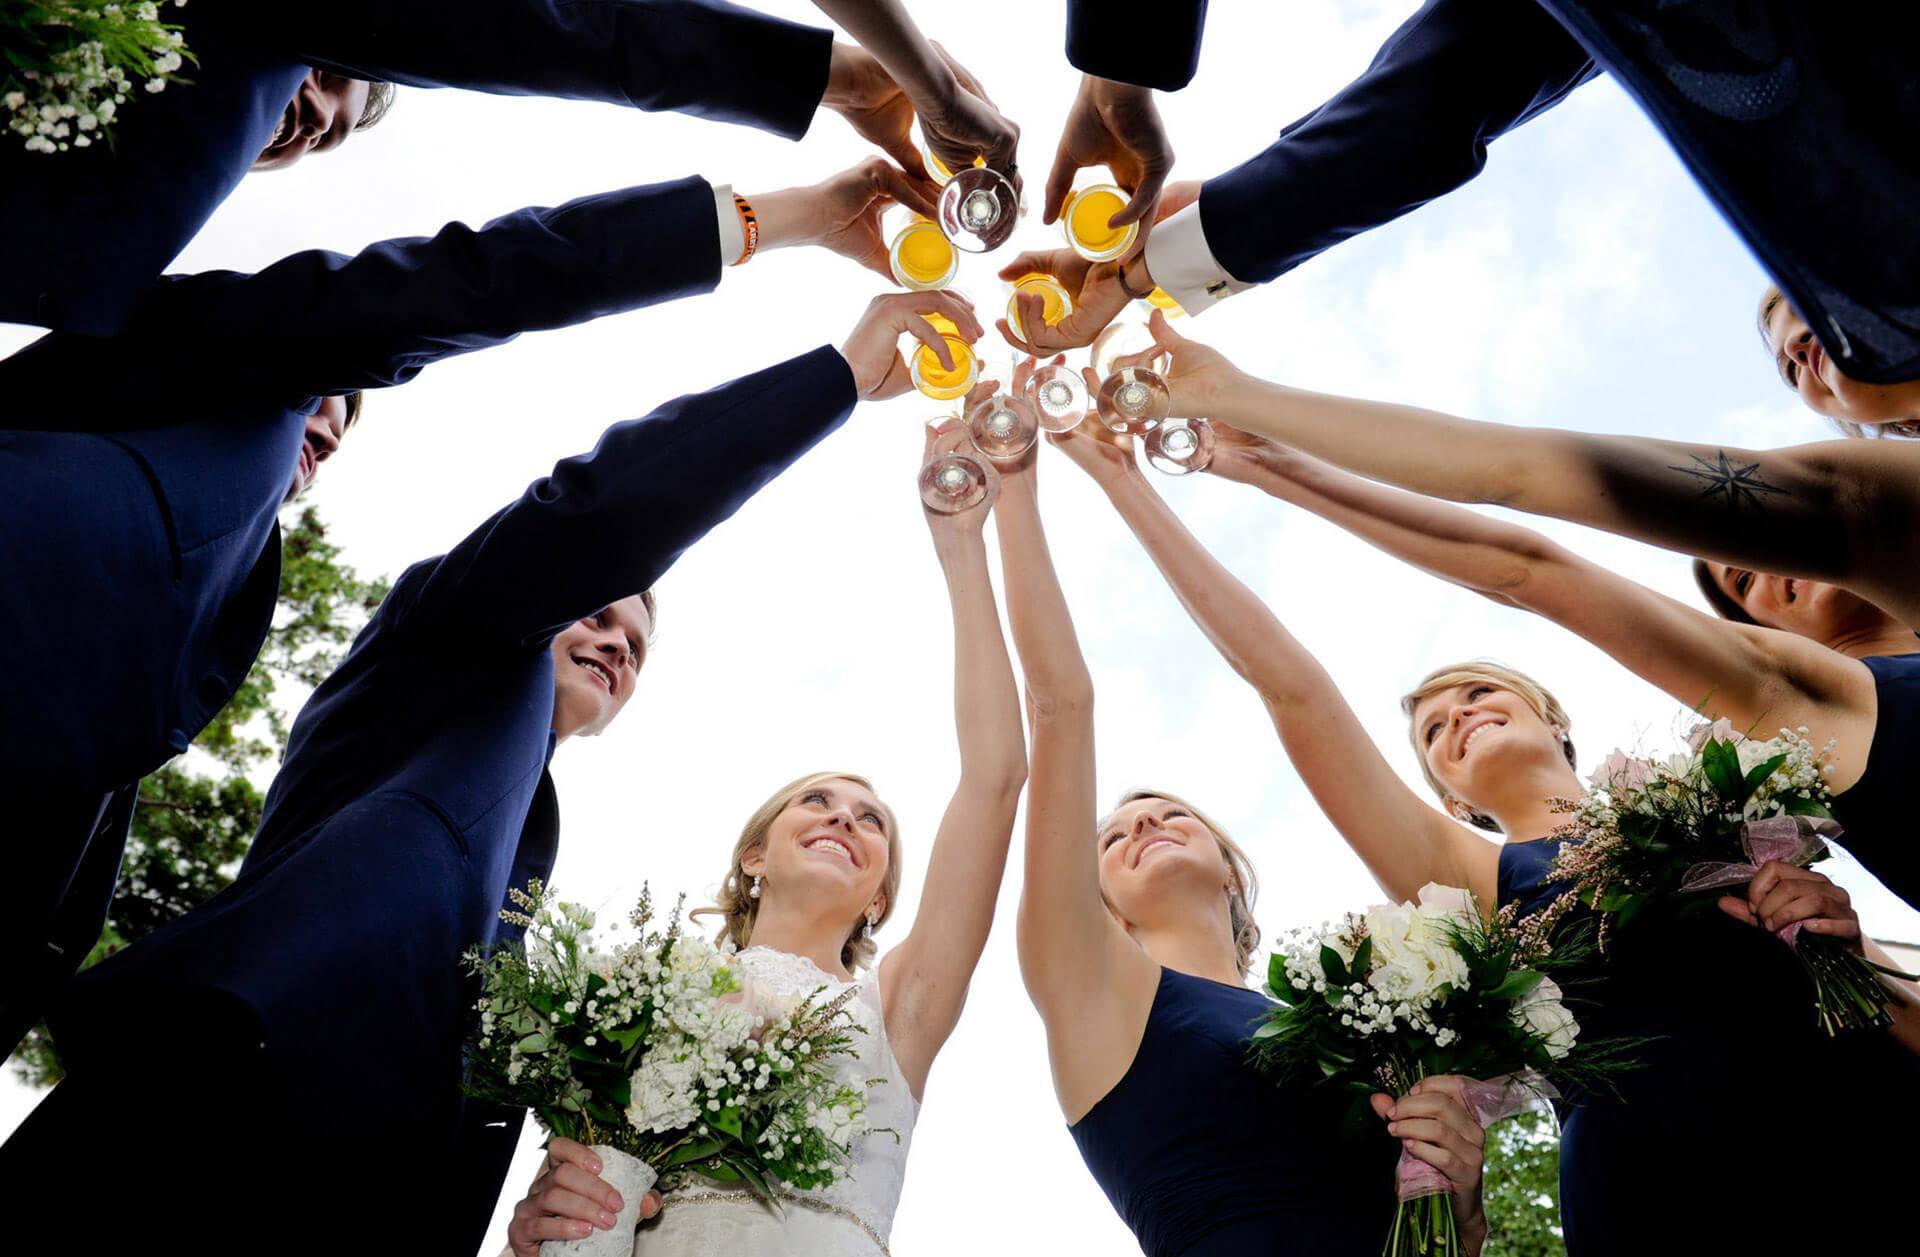 The wedding party toasts outside their Addison Oaks wedding reception in Leonard, Michigan.